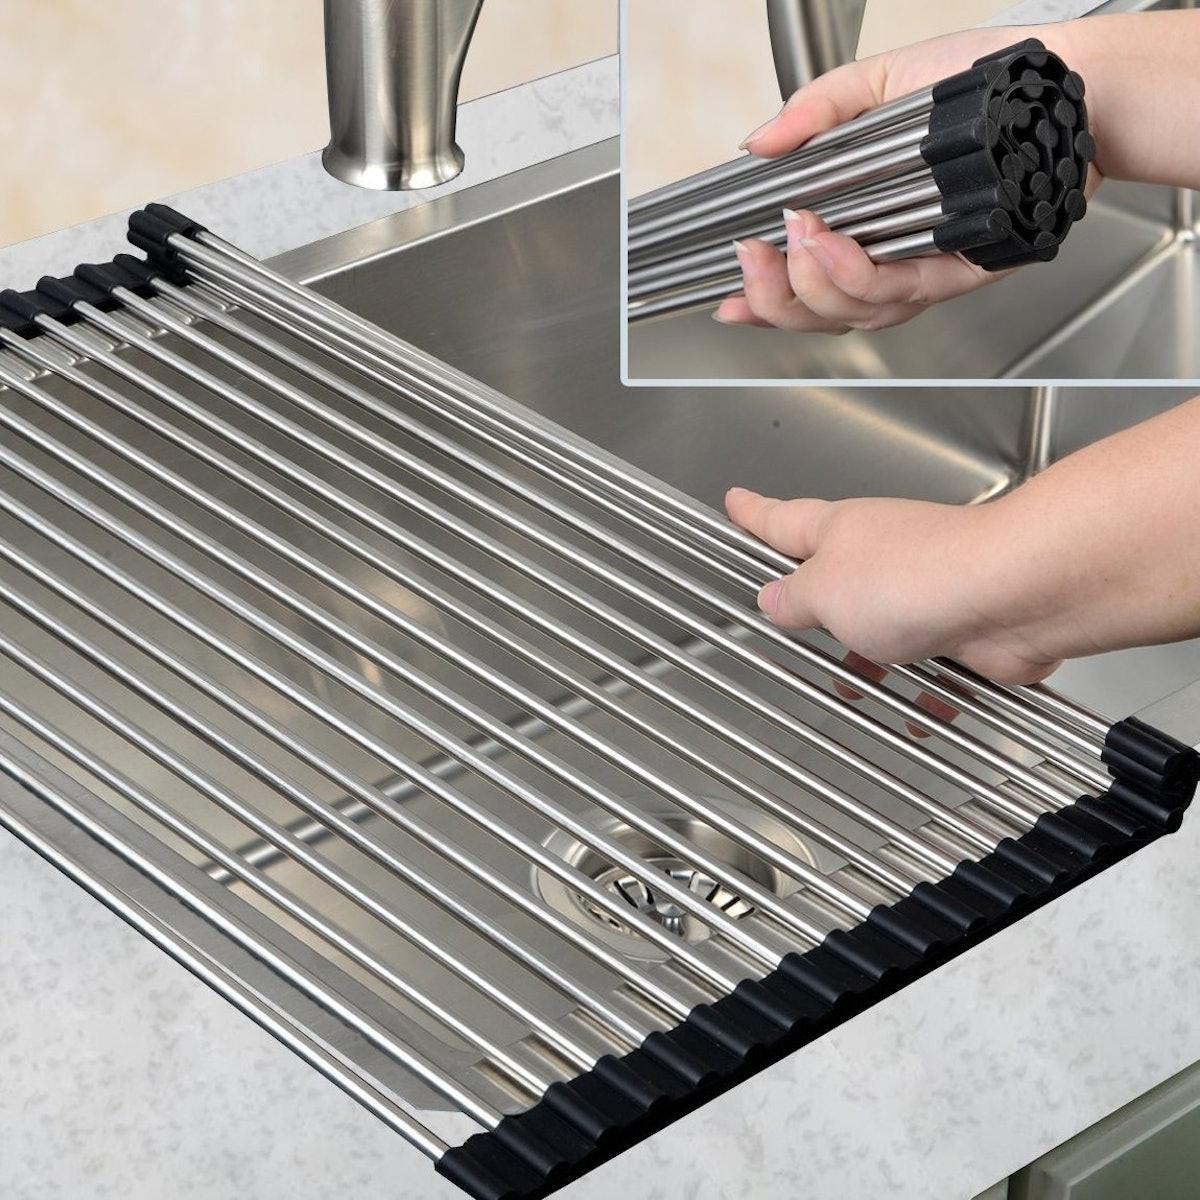 VAPSINT Roll-Up Dish Drying Rack